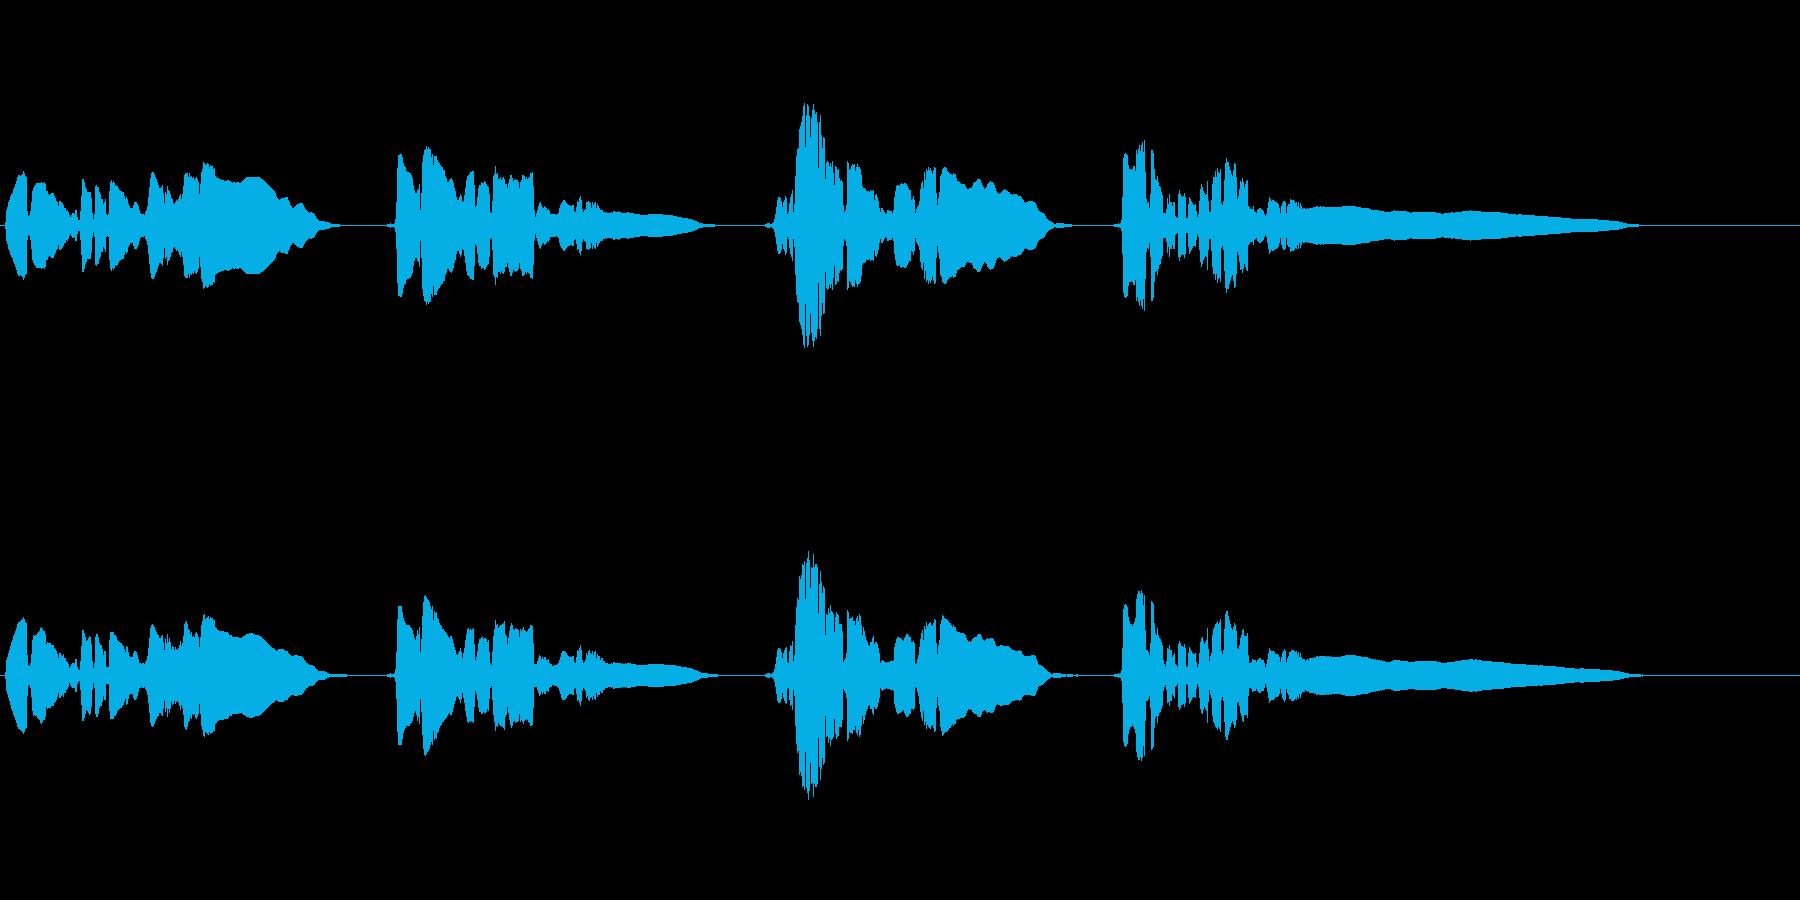 saxの官能メロディーの曲です。の再生済みの波形